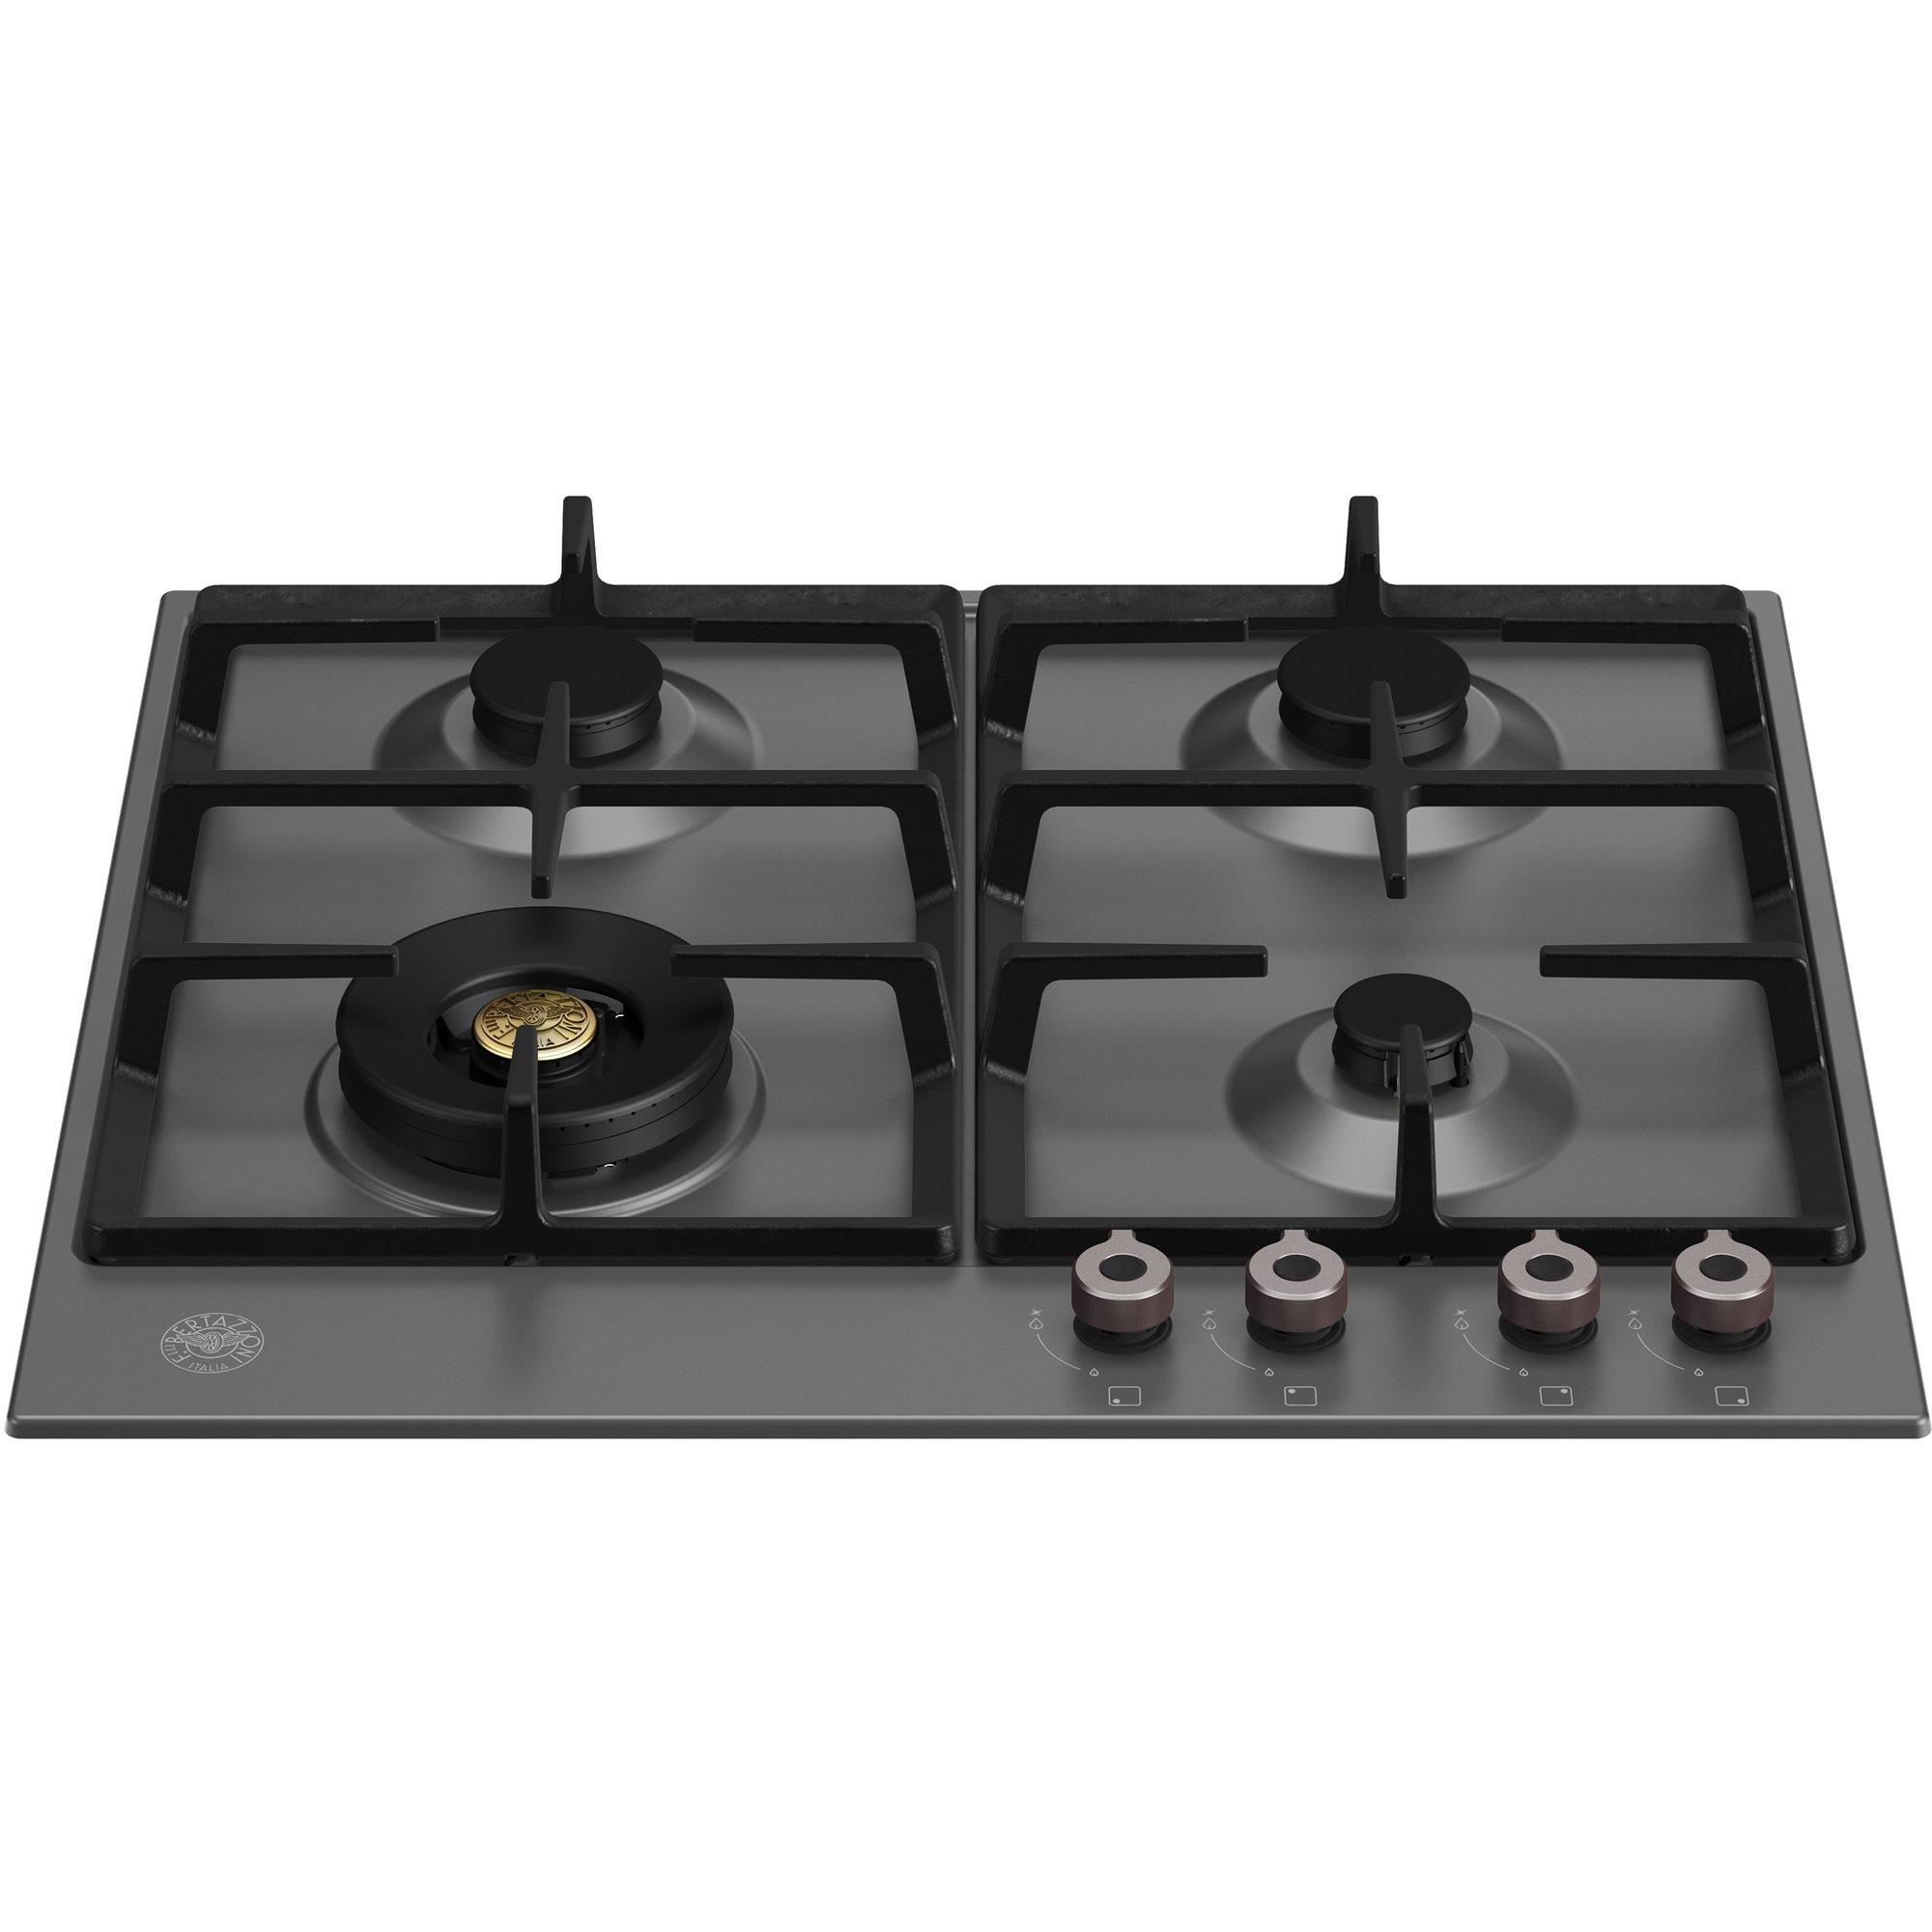 Bertazzoni Professional gasspis svart 60 cm.